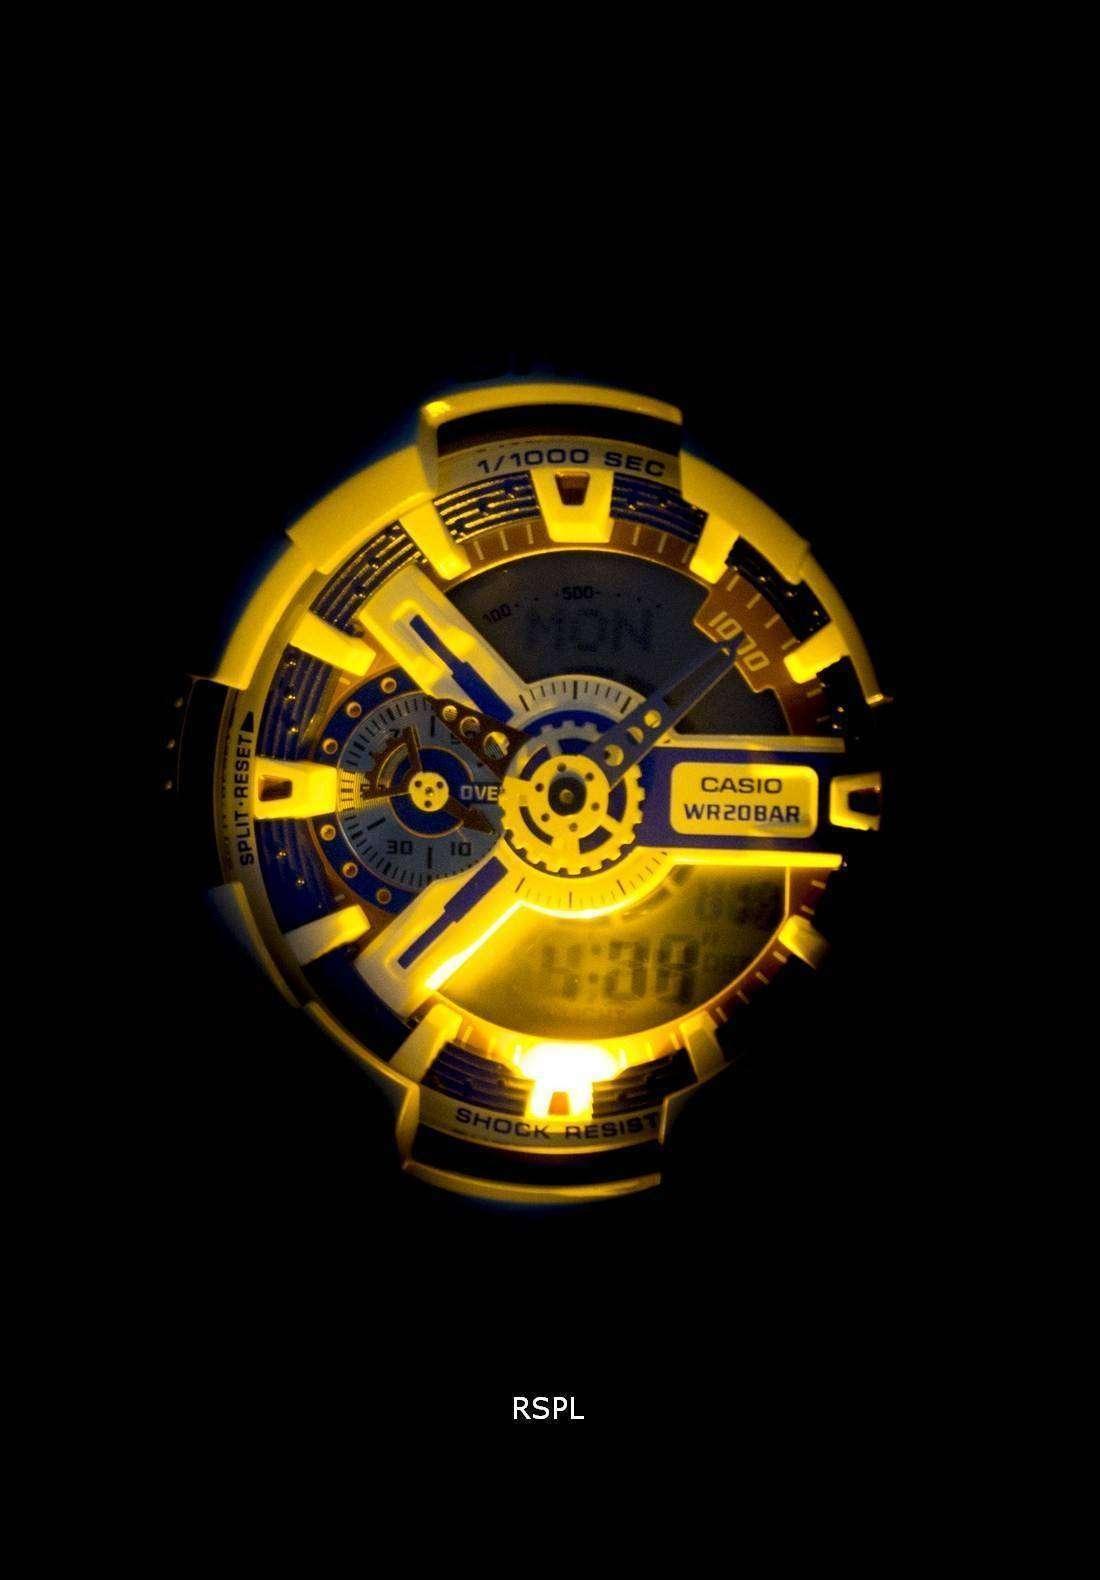 Casio G Shock Analog Digital World Time Ga 110tr 7a Mens Watch Gd X6900ht 2 Resin Band Blue